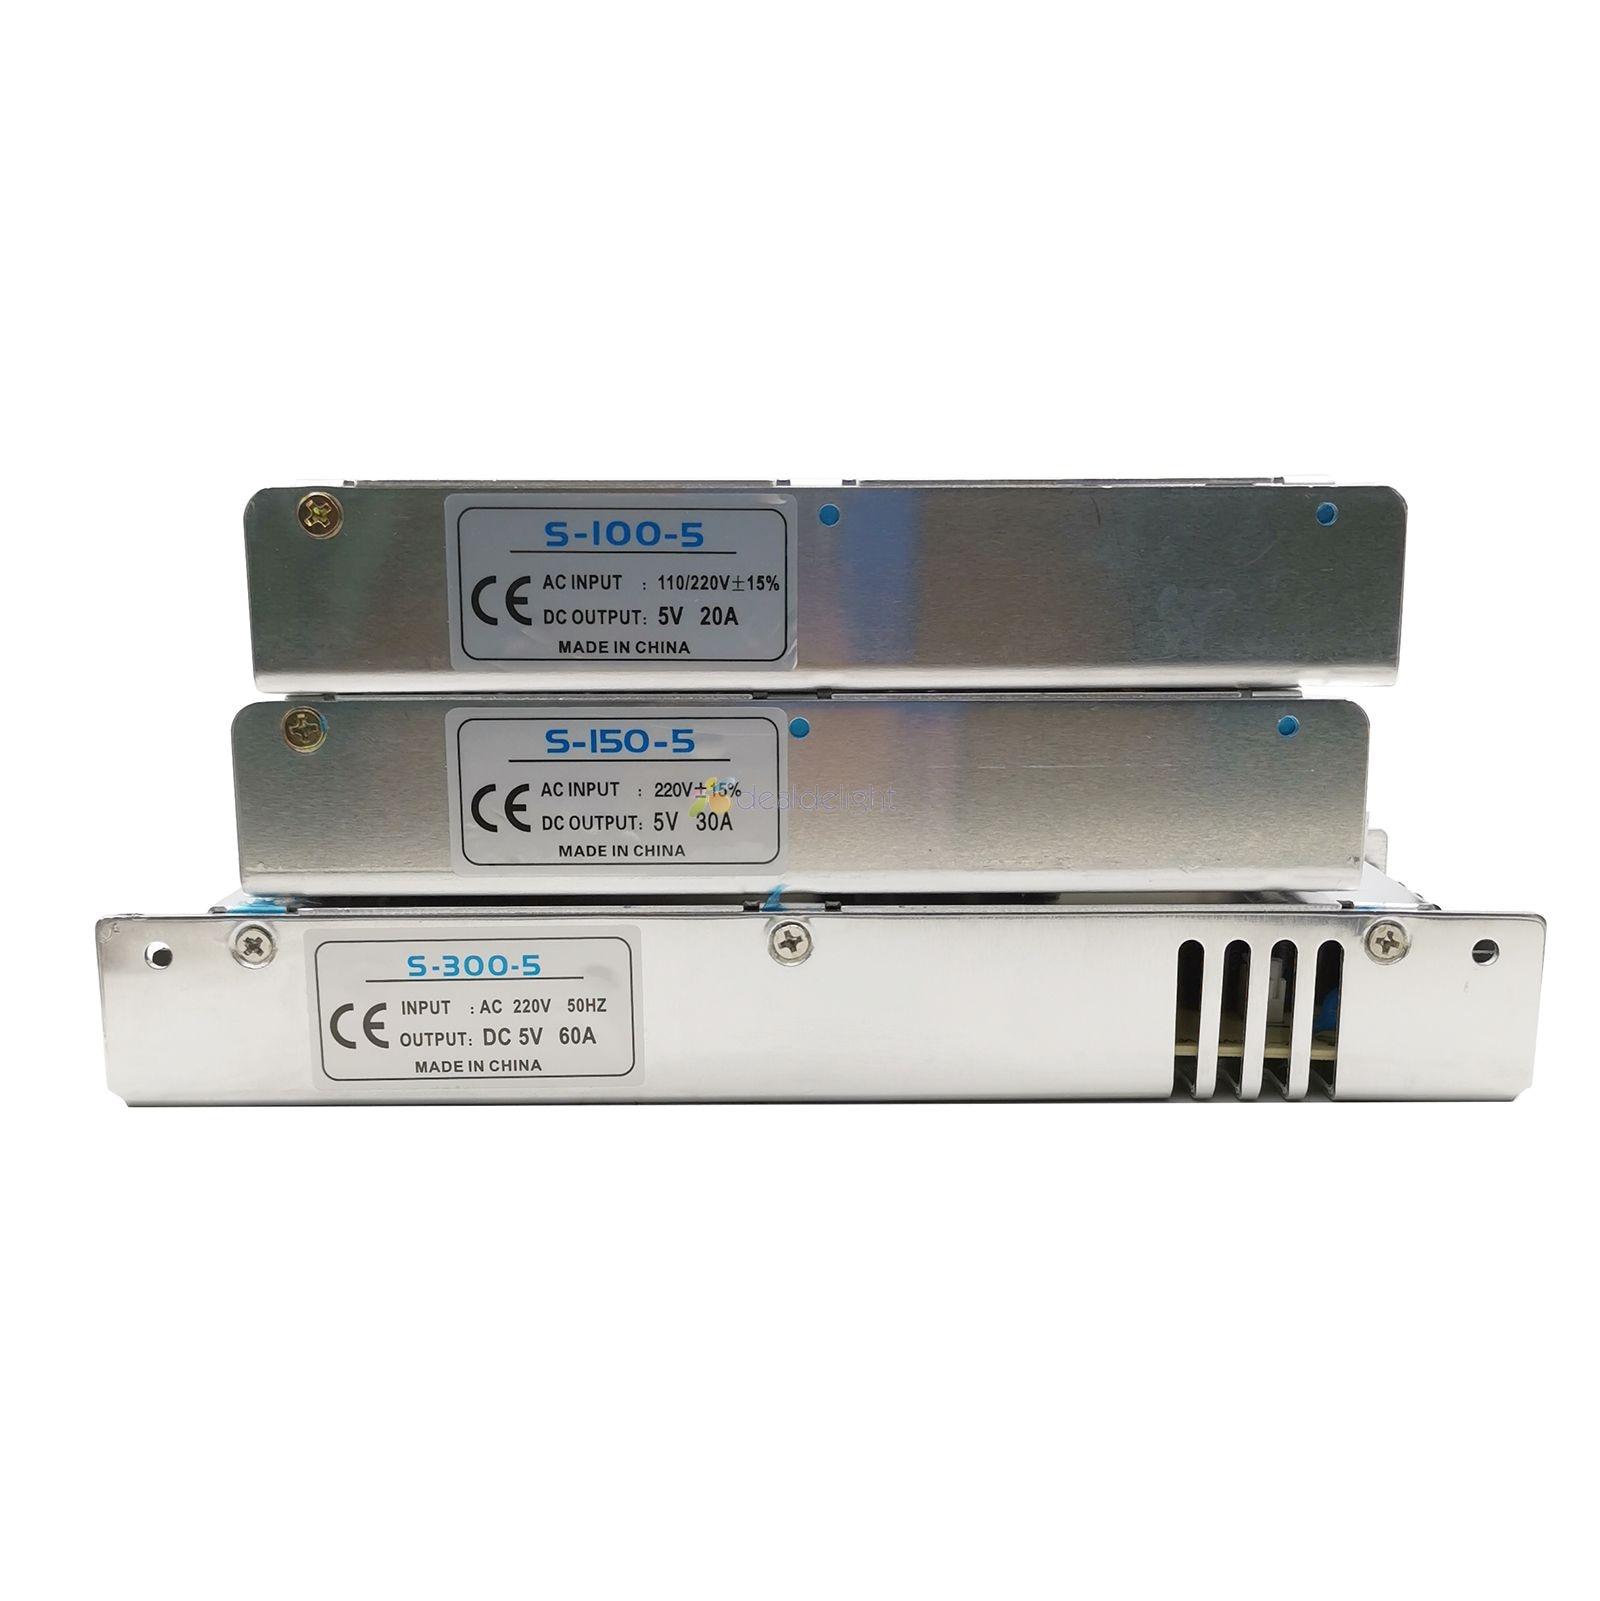 Ultra-dünne Schalt netzteil DC 5V 4A 20A 30A 40A 60A Led-treiber Transformator 110V 220V AC Zu DC5V Für Led Streifen Display